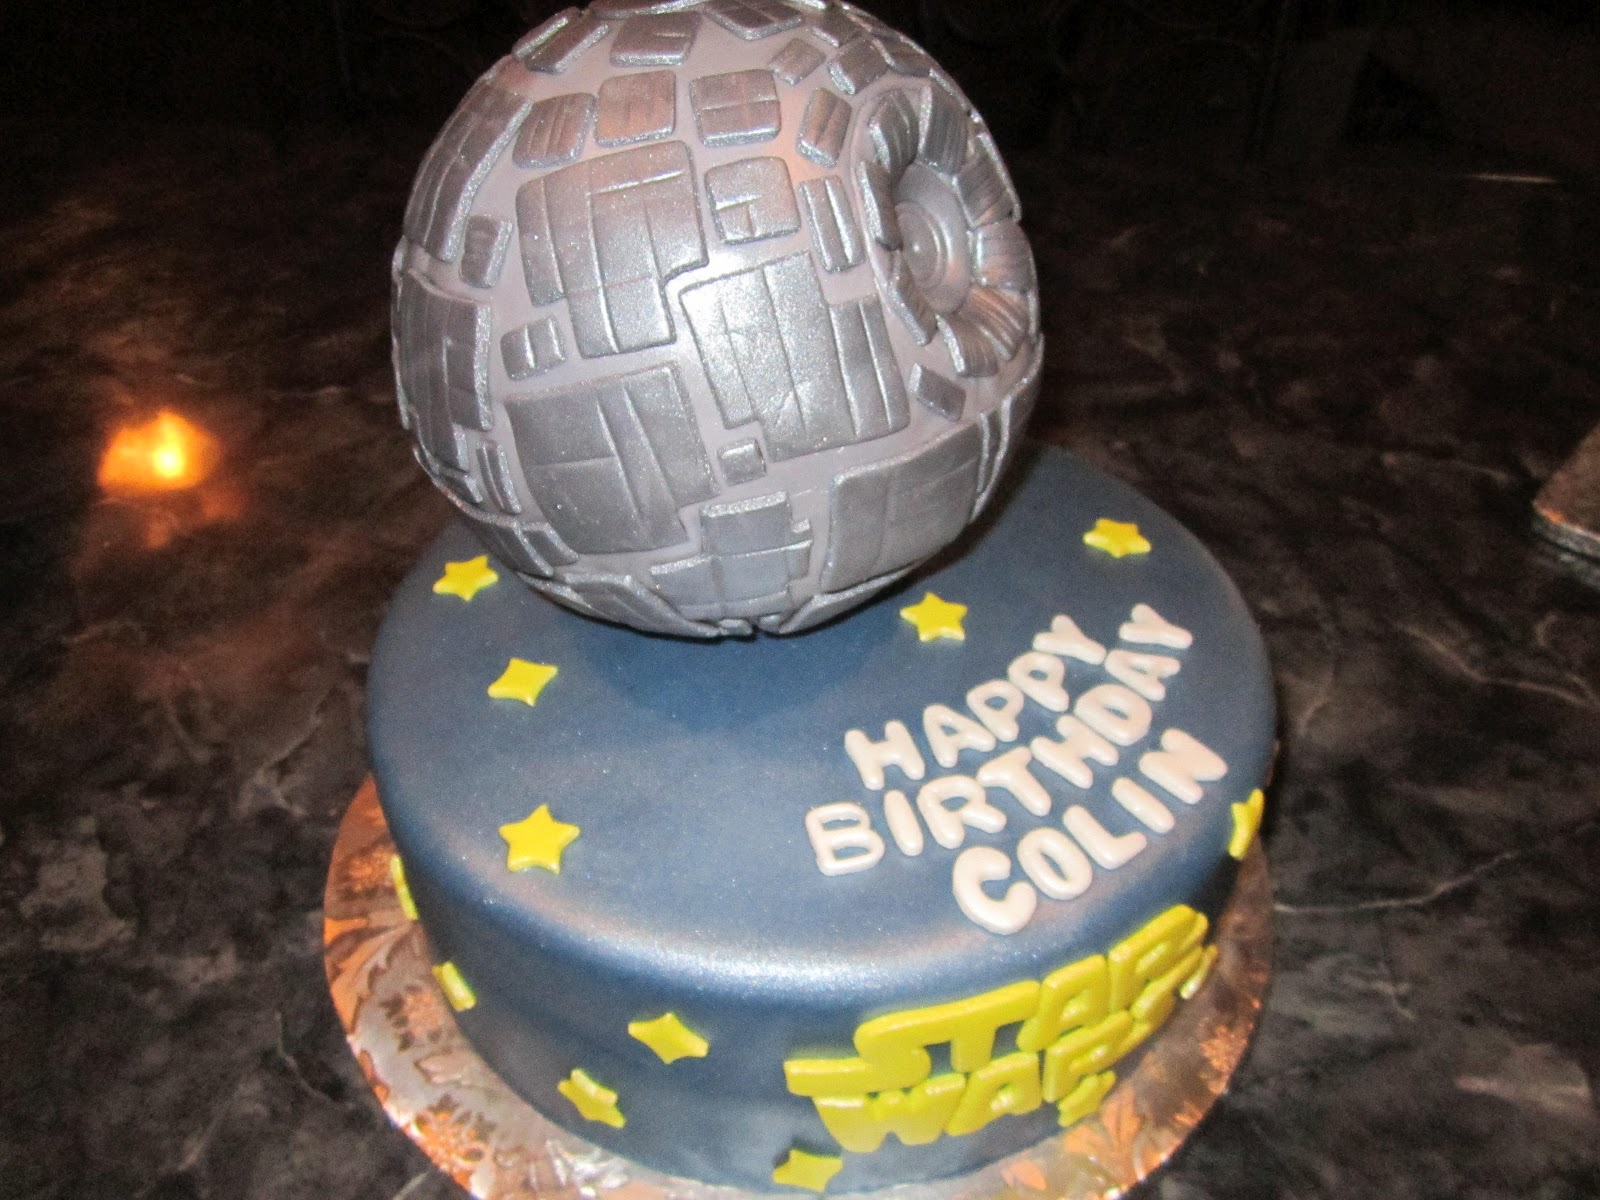 MyMoniCakes: Star Wars Death Star Cake